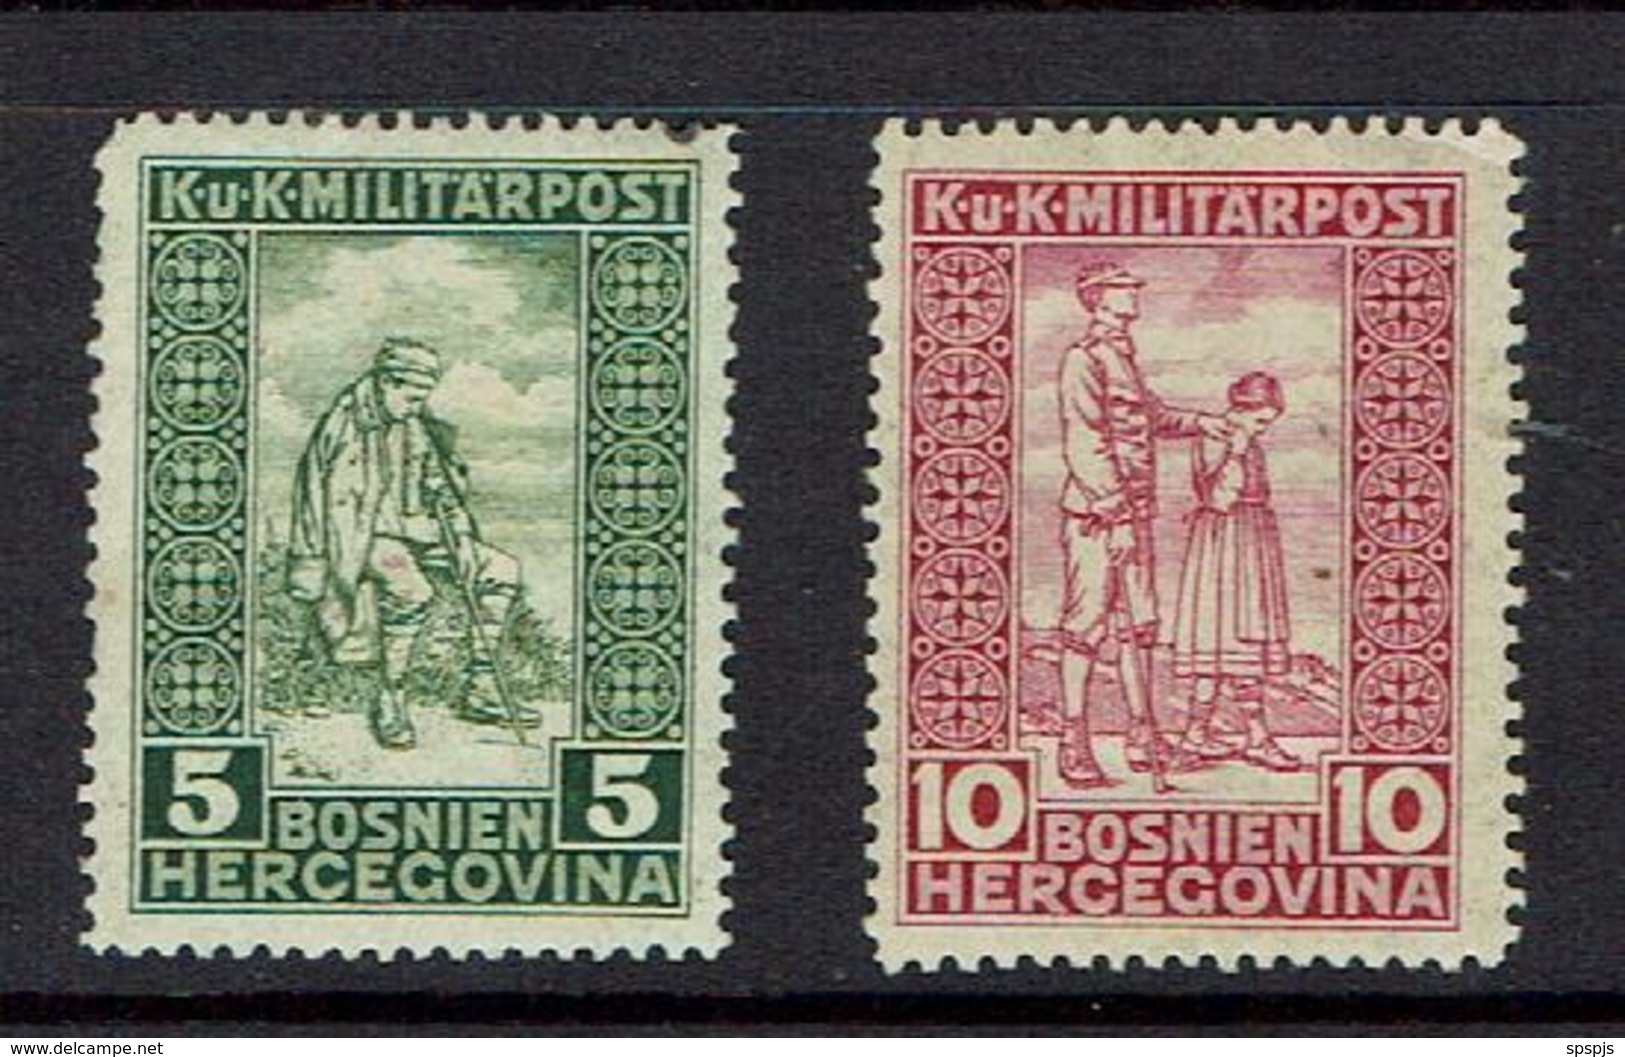 BOSNIA AND HERZEGOVINA...mh...1916 - Bosnia And Herzegovina